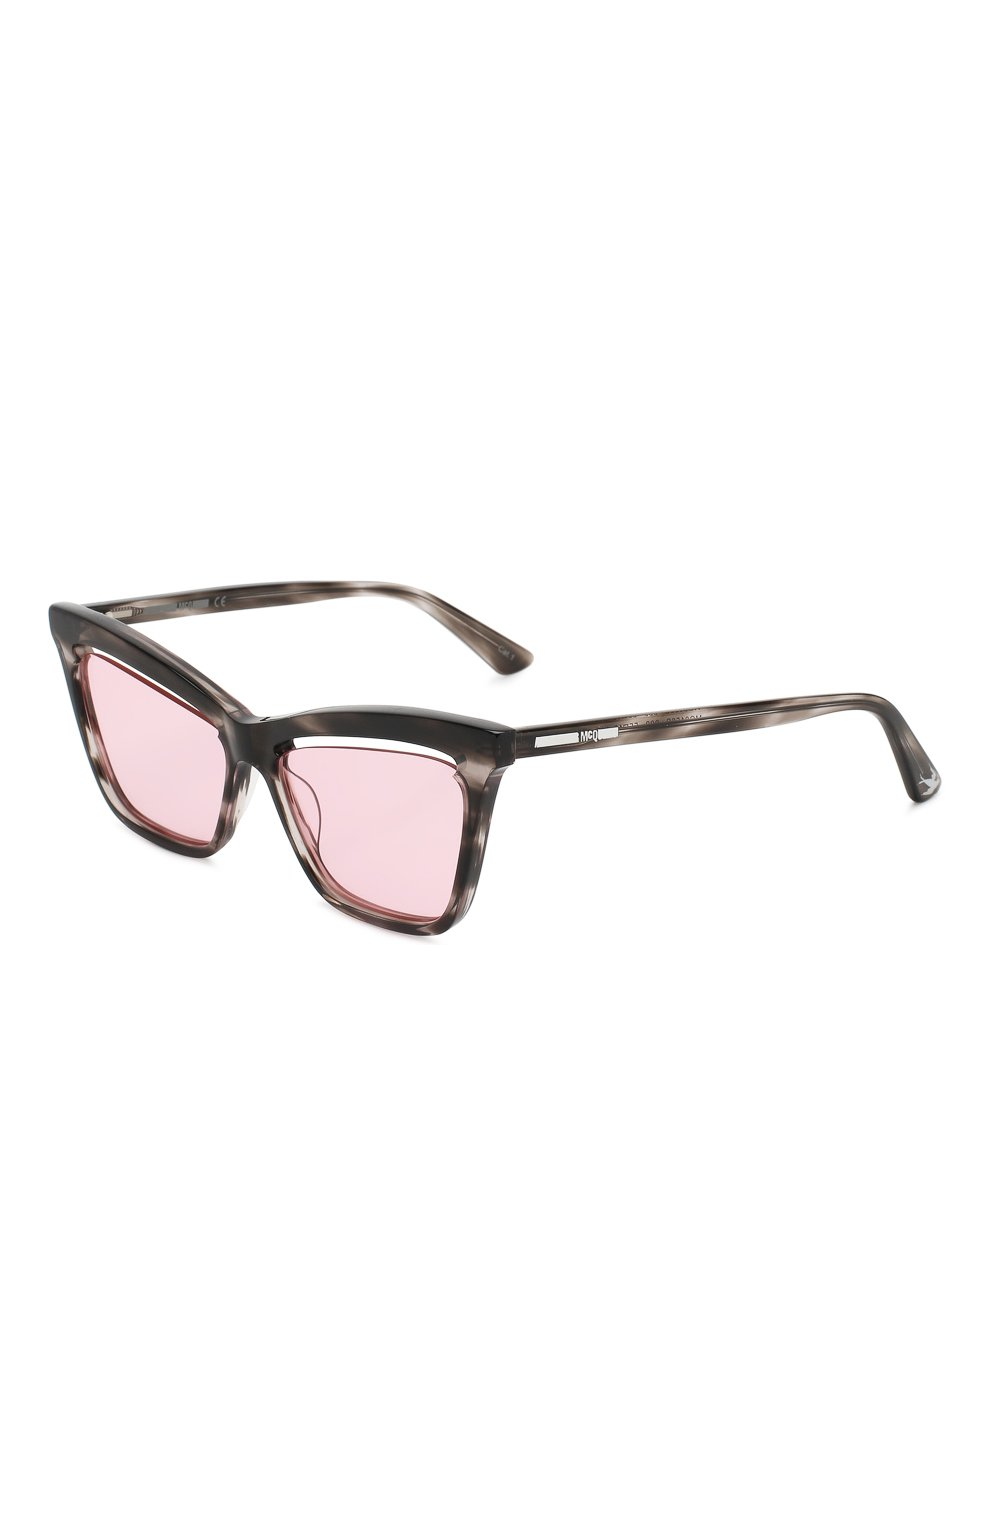 Женские солнцезащитные очки MCQ SWALLOW розового цвета, арт. MQ0156 003 | Фото 1 (Тип очков: С/з; Статус проверки: Проверено, Проверена категория; Оптика Гендер: оптика-женское; Очки форма: Cat-eye)